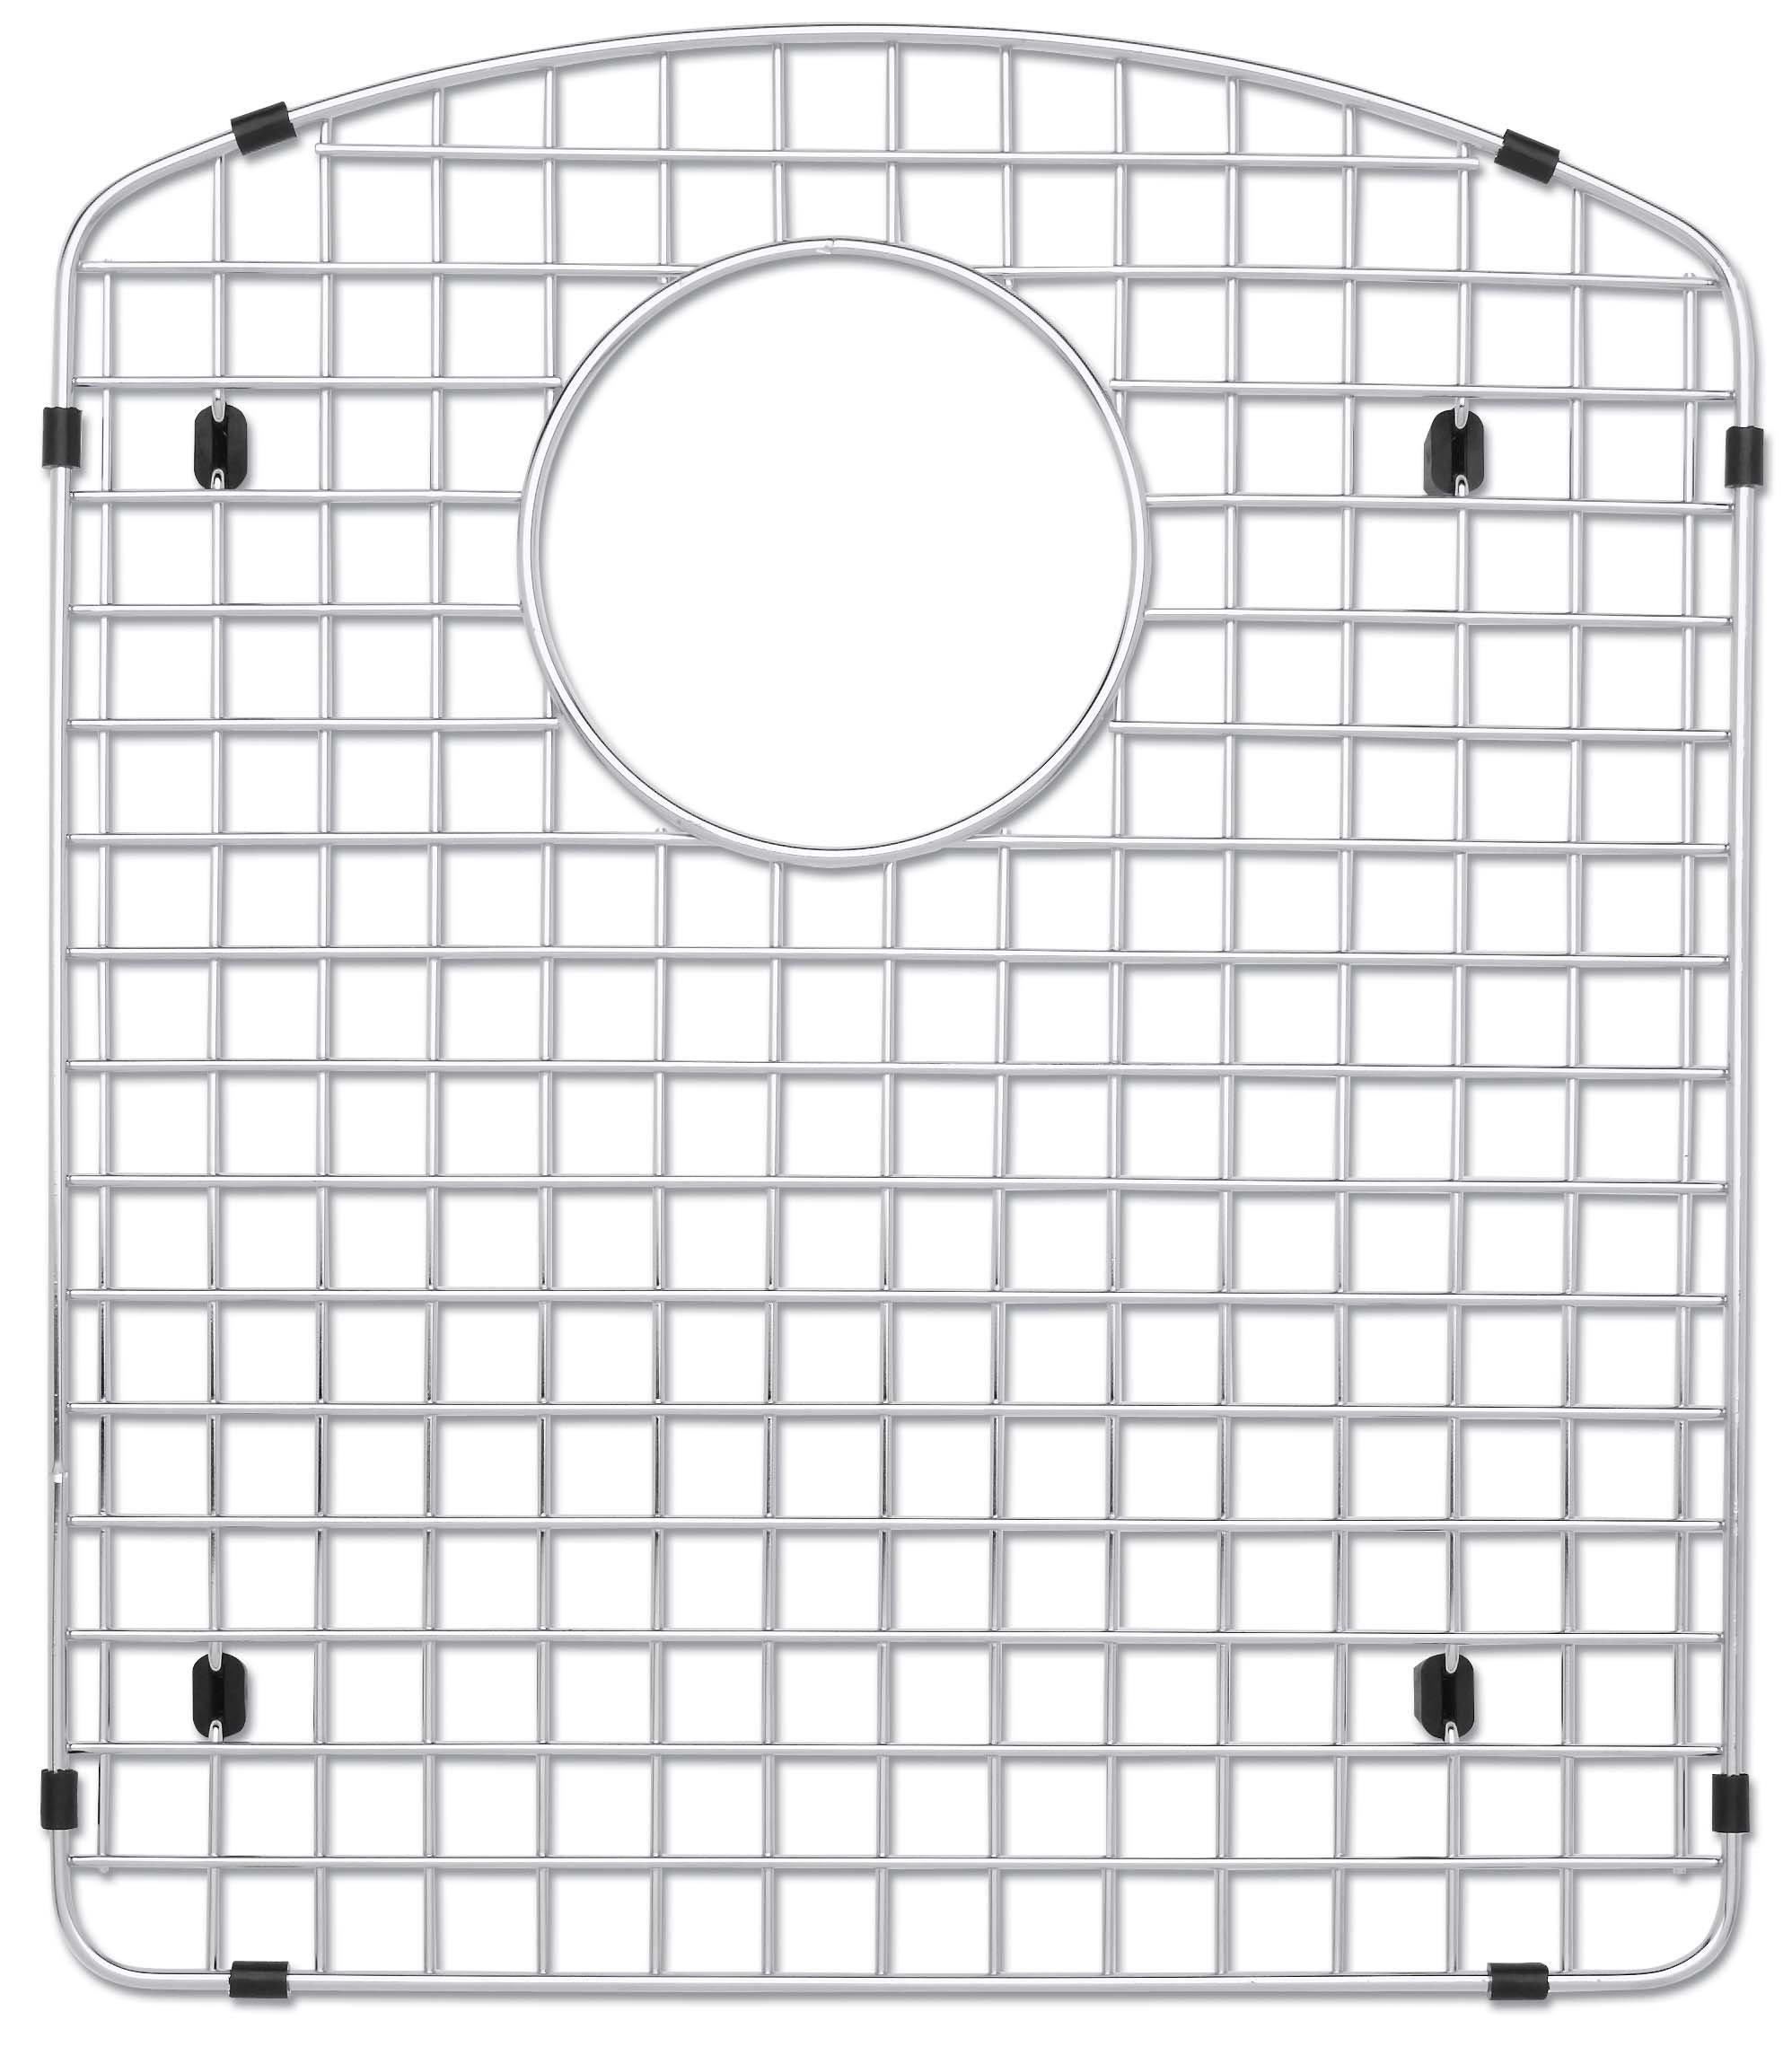 Blanco 220-998 Stainless Steel Sink Grid by Blanco